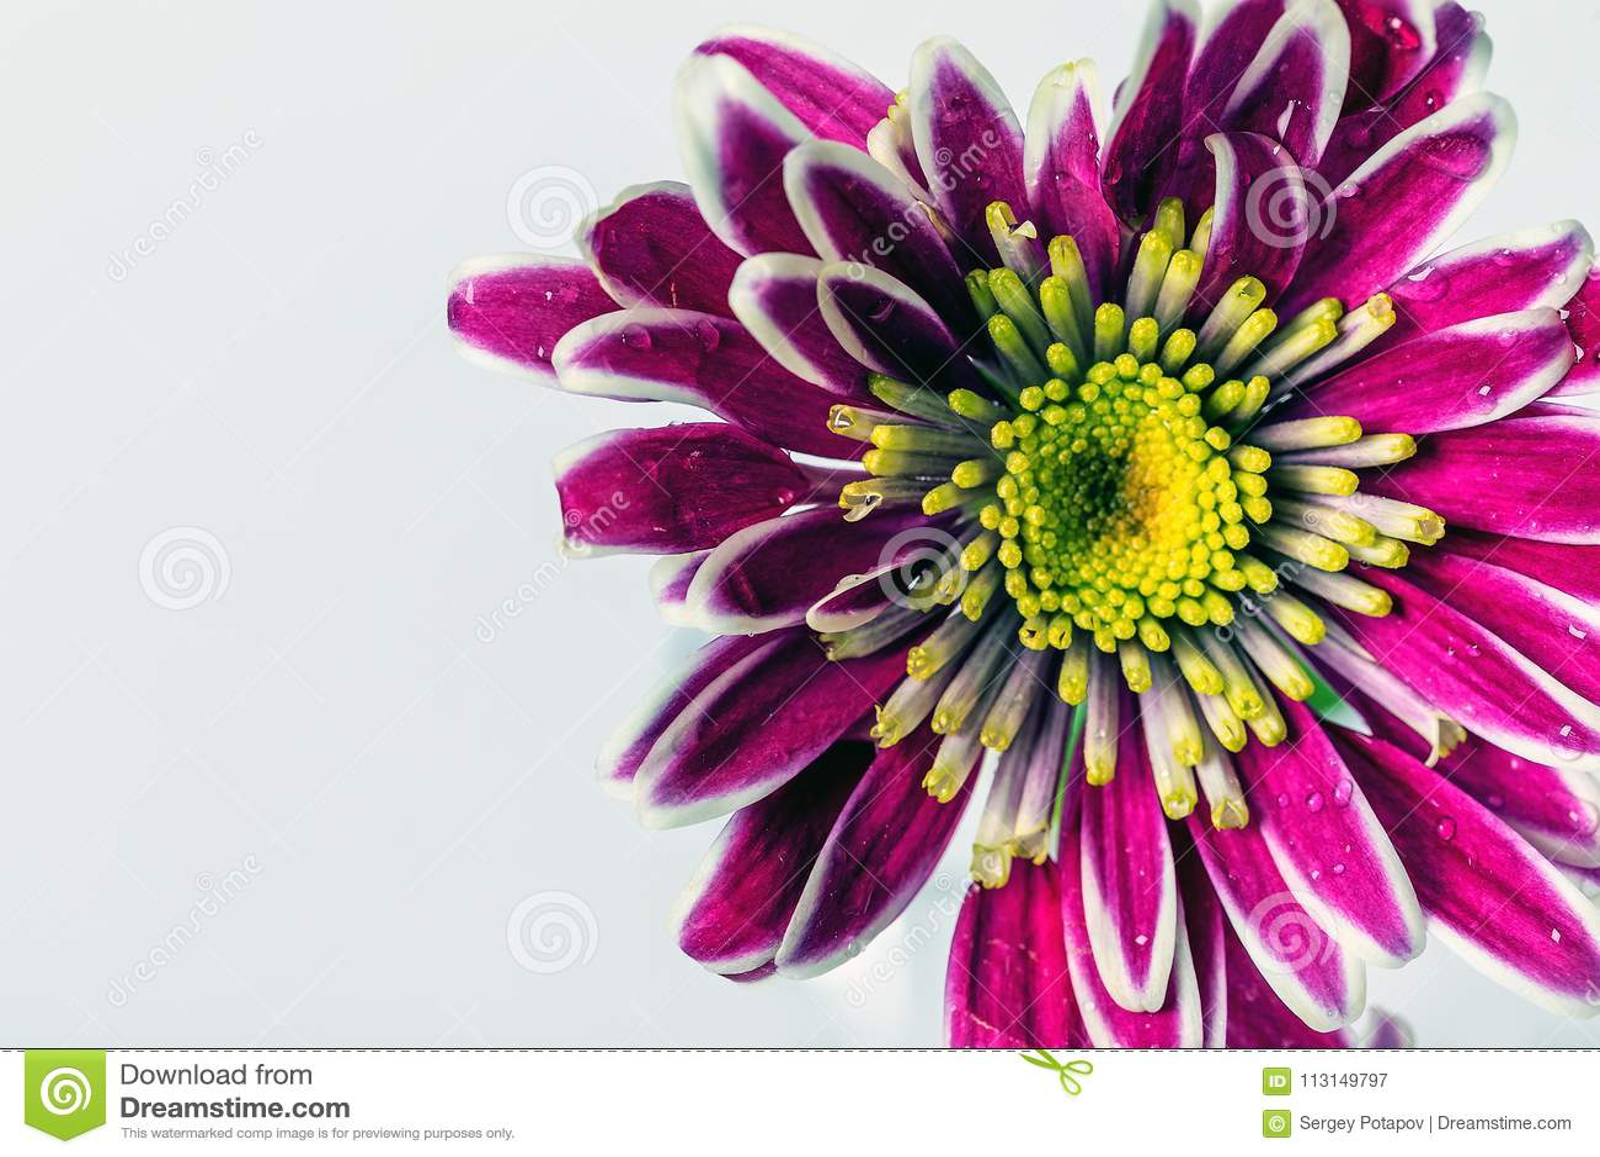 Beautiful flower on white background stock image image of flowers download beautiful flower on white background stock image image of flowers yellow izmirmasajfo